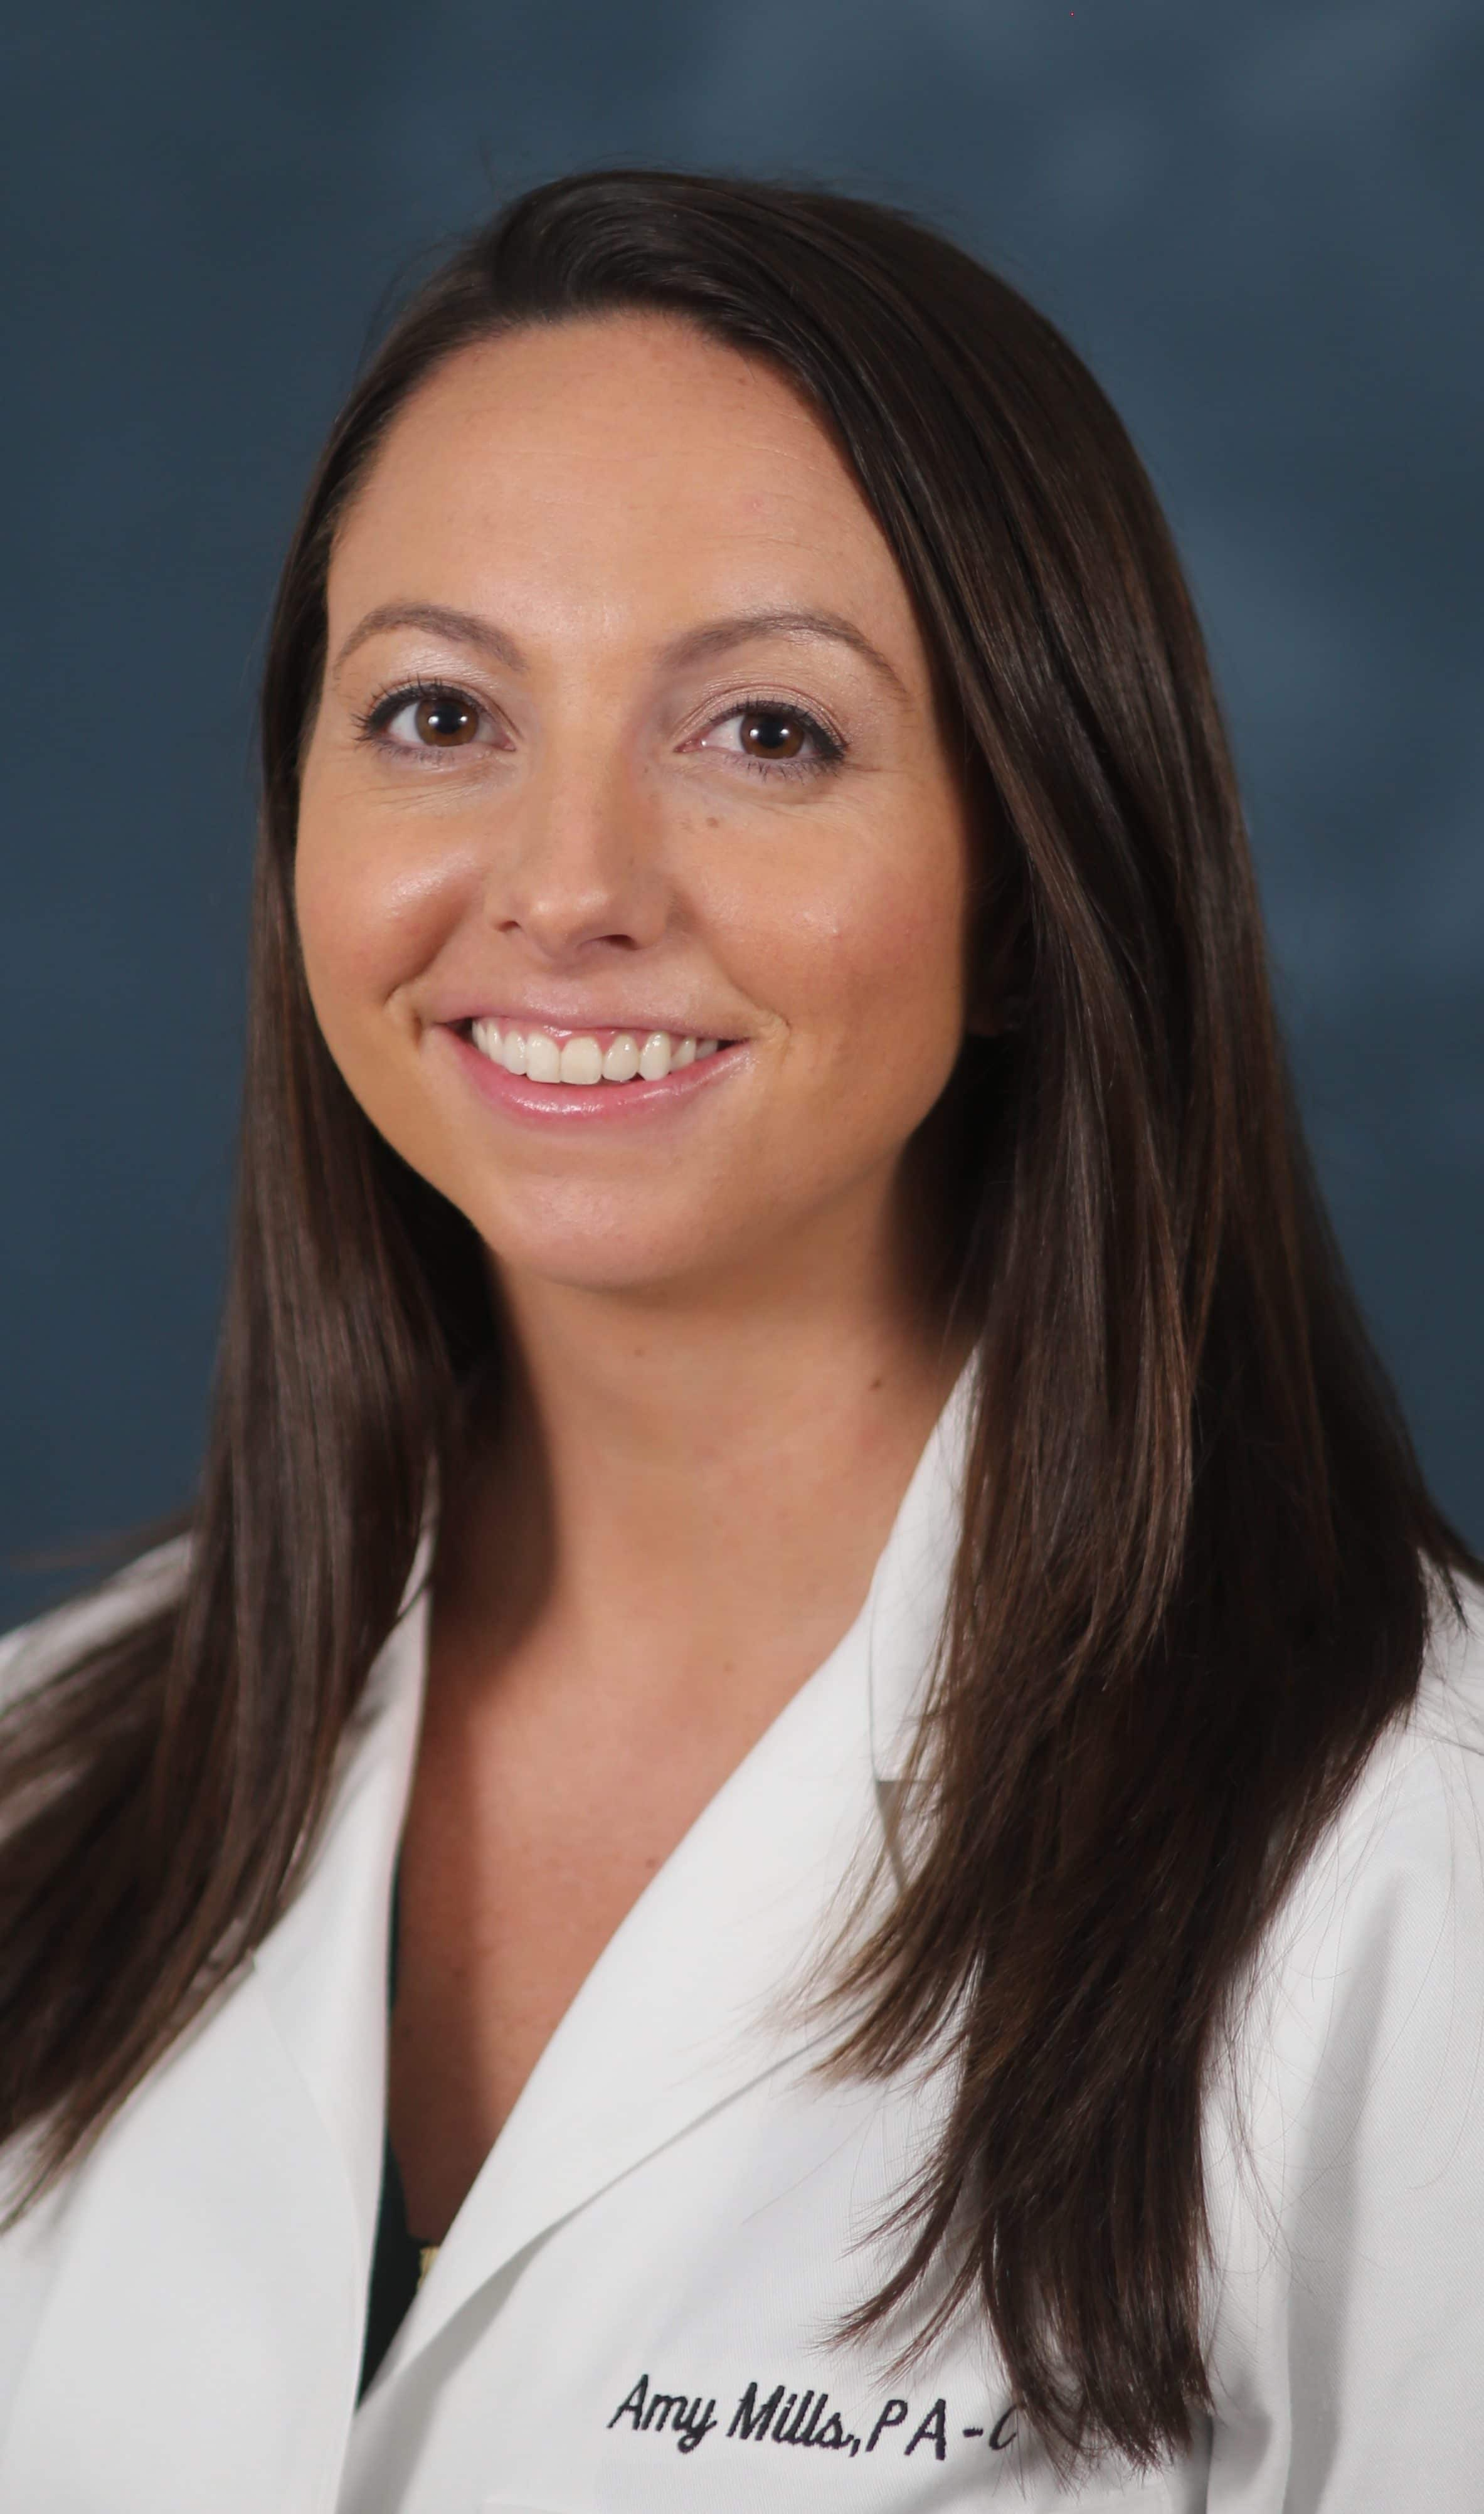 Amy Mills, PA-C